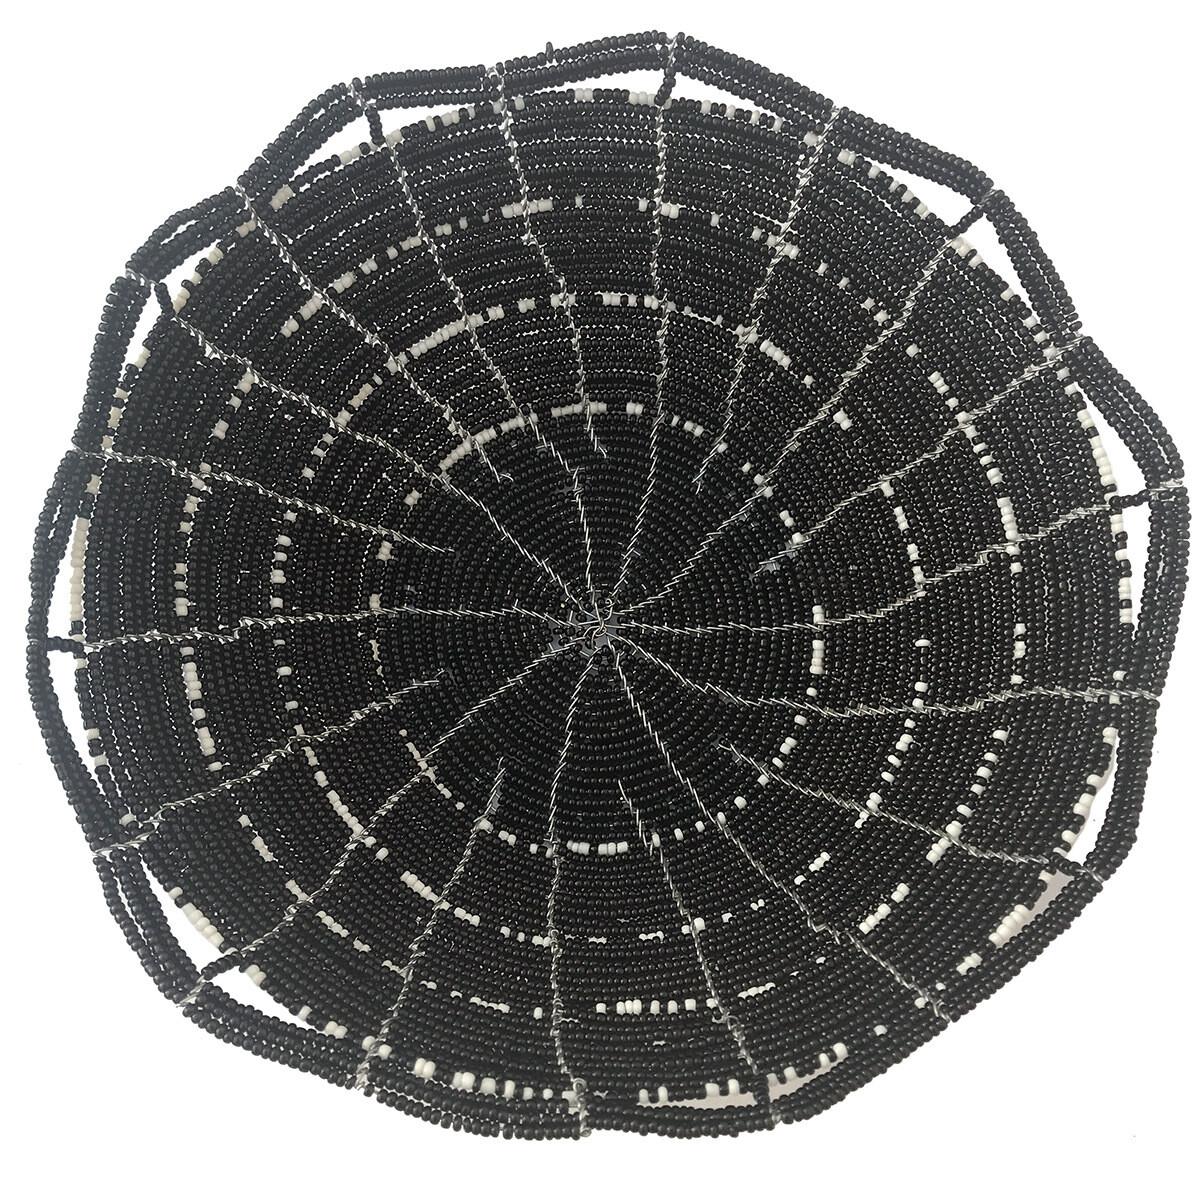 Beaded Bowl - Black and White